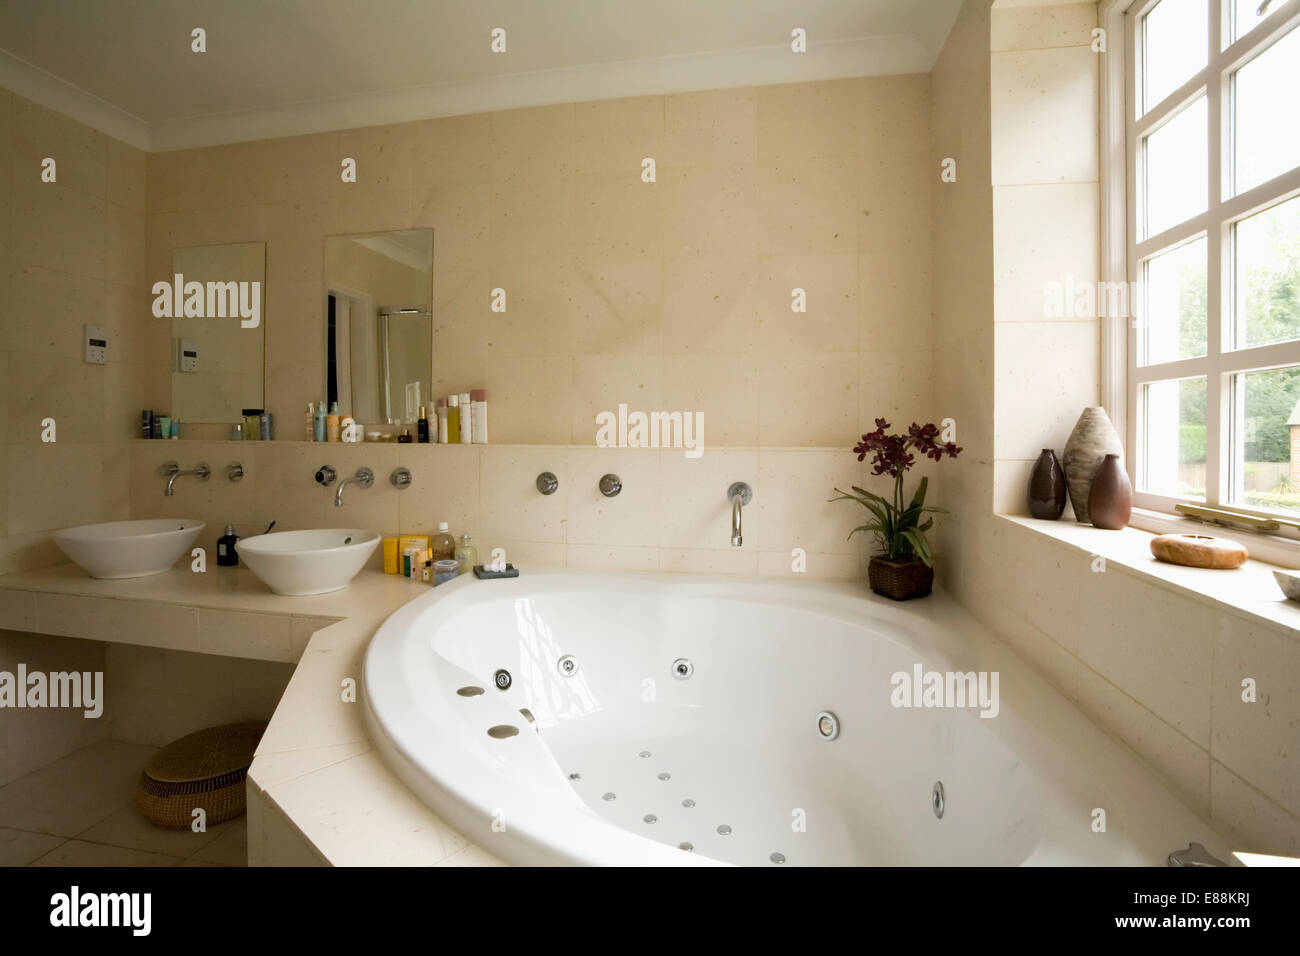 Corner jacuzzi bath below window in modern bathroom with limestone